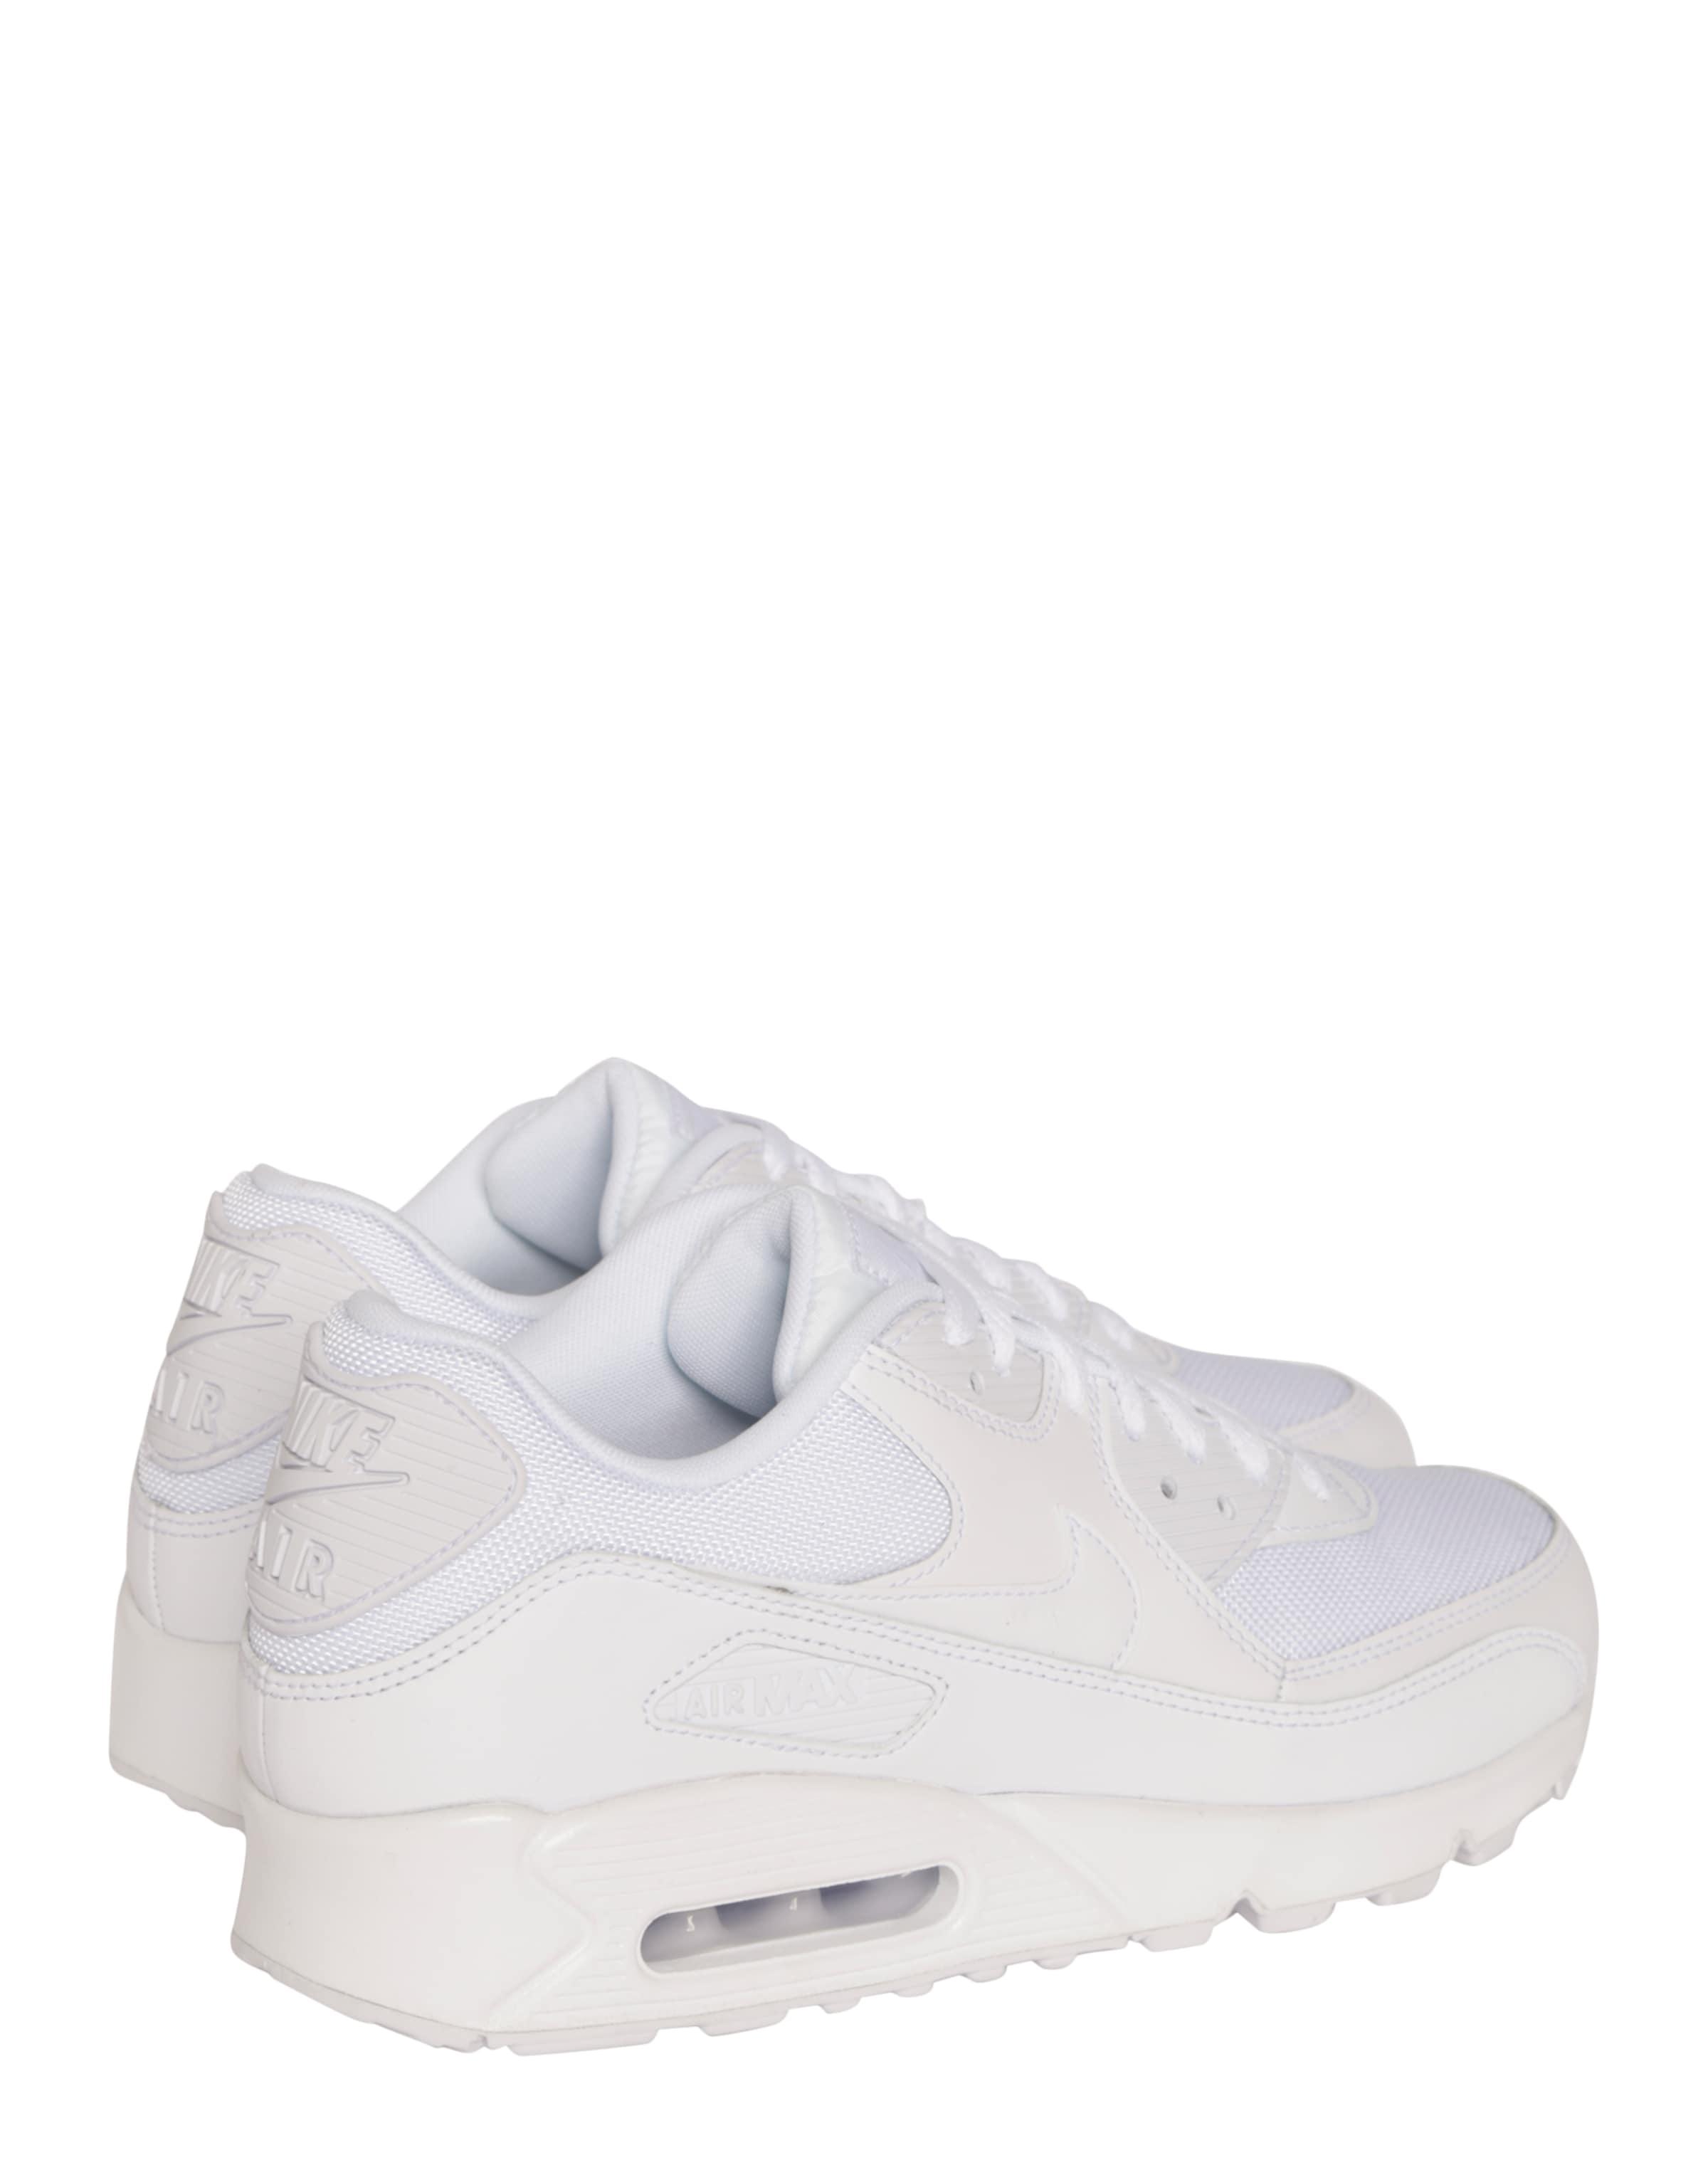 Sportswear Essential' Sneaker 'air Nike 90 Weiß Max In PiTOkZuwX